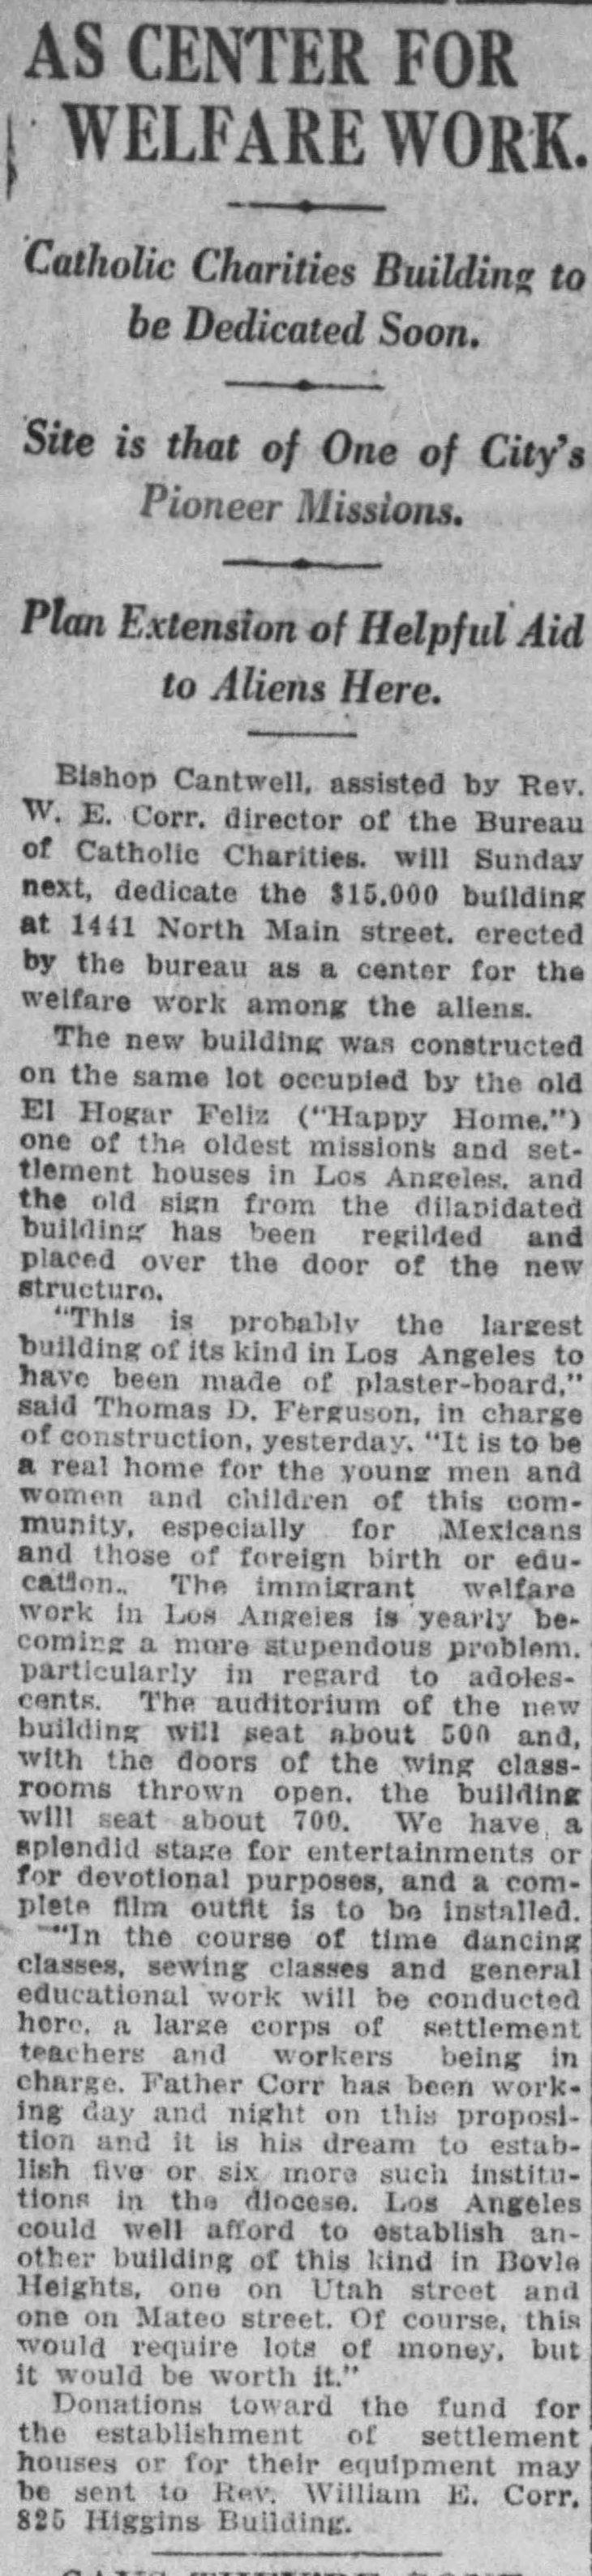 Santa Rita replaces Hogar Feliz The_Los_Angeles_Times_Tue__Feb_17__1920_